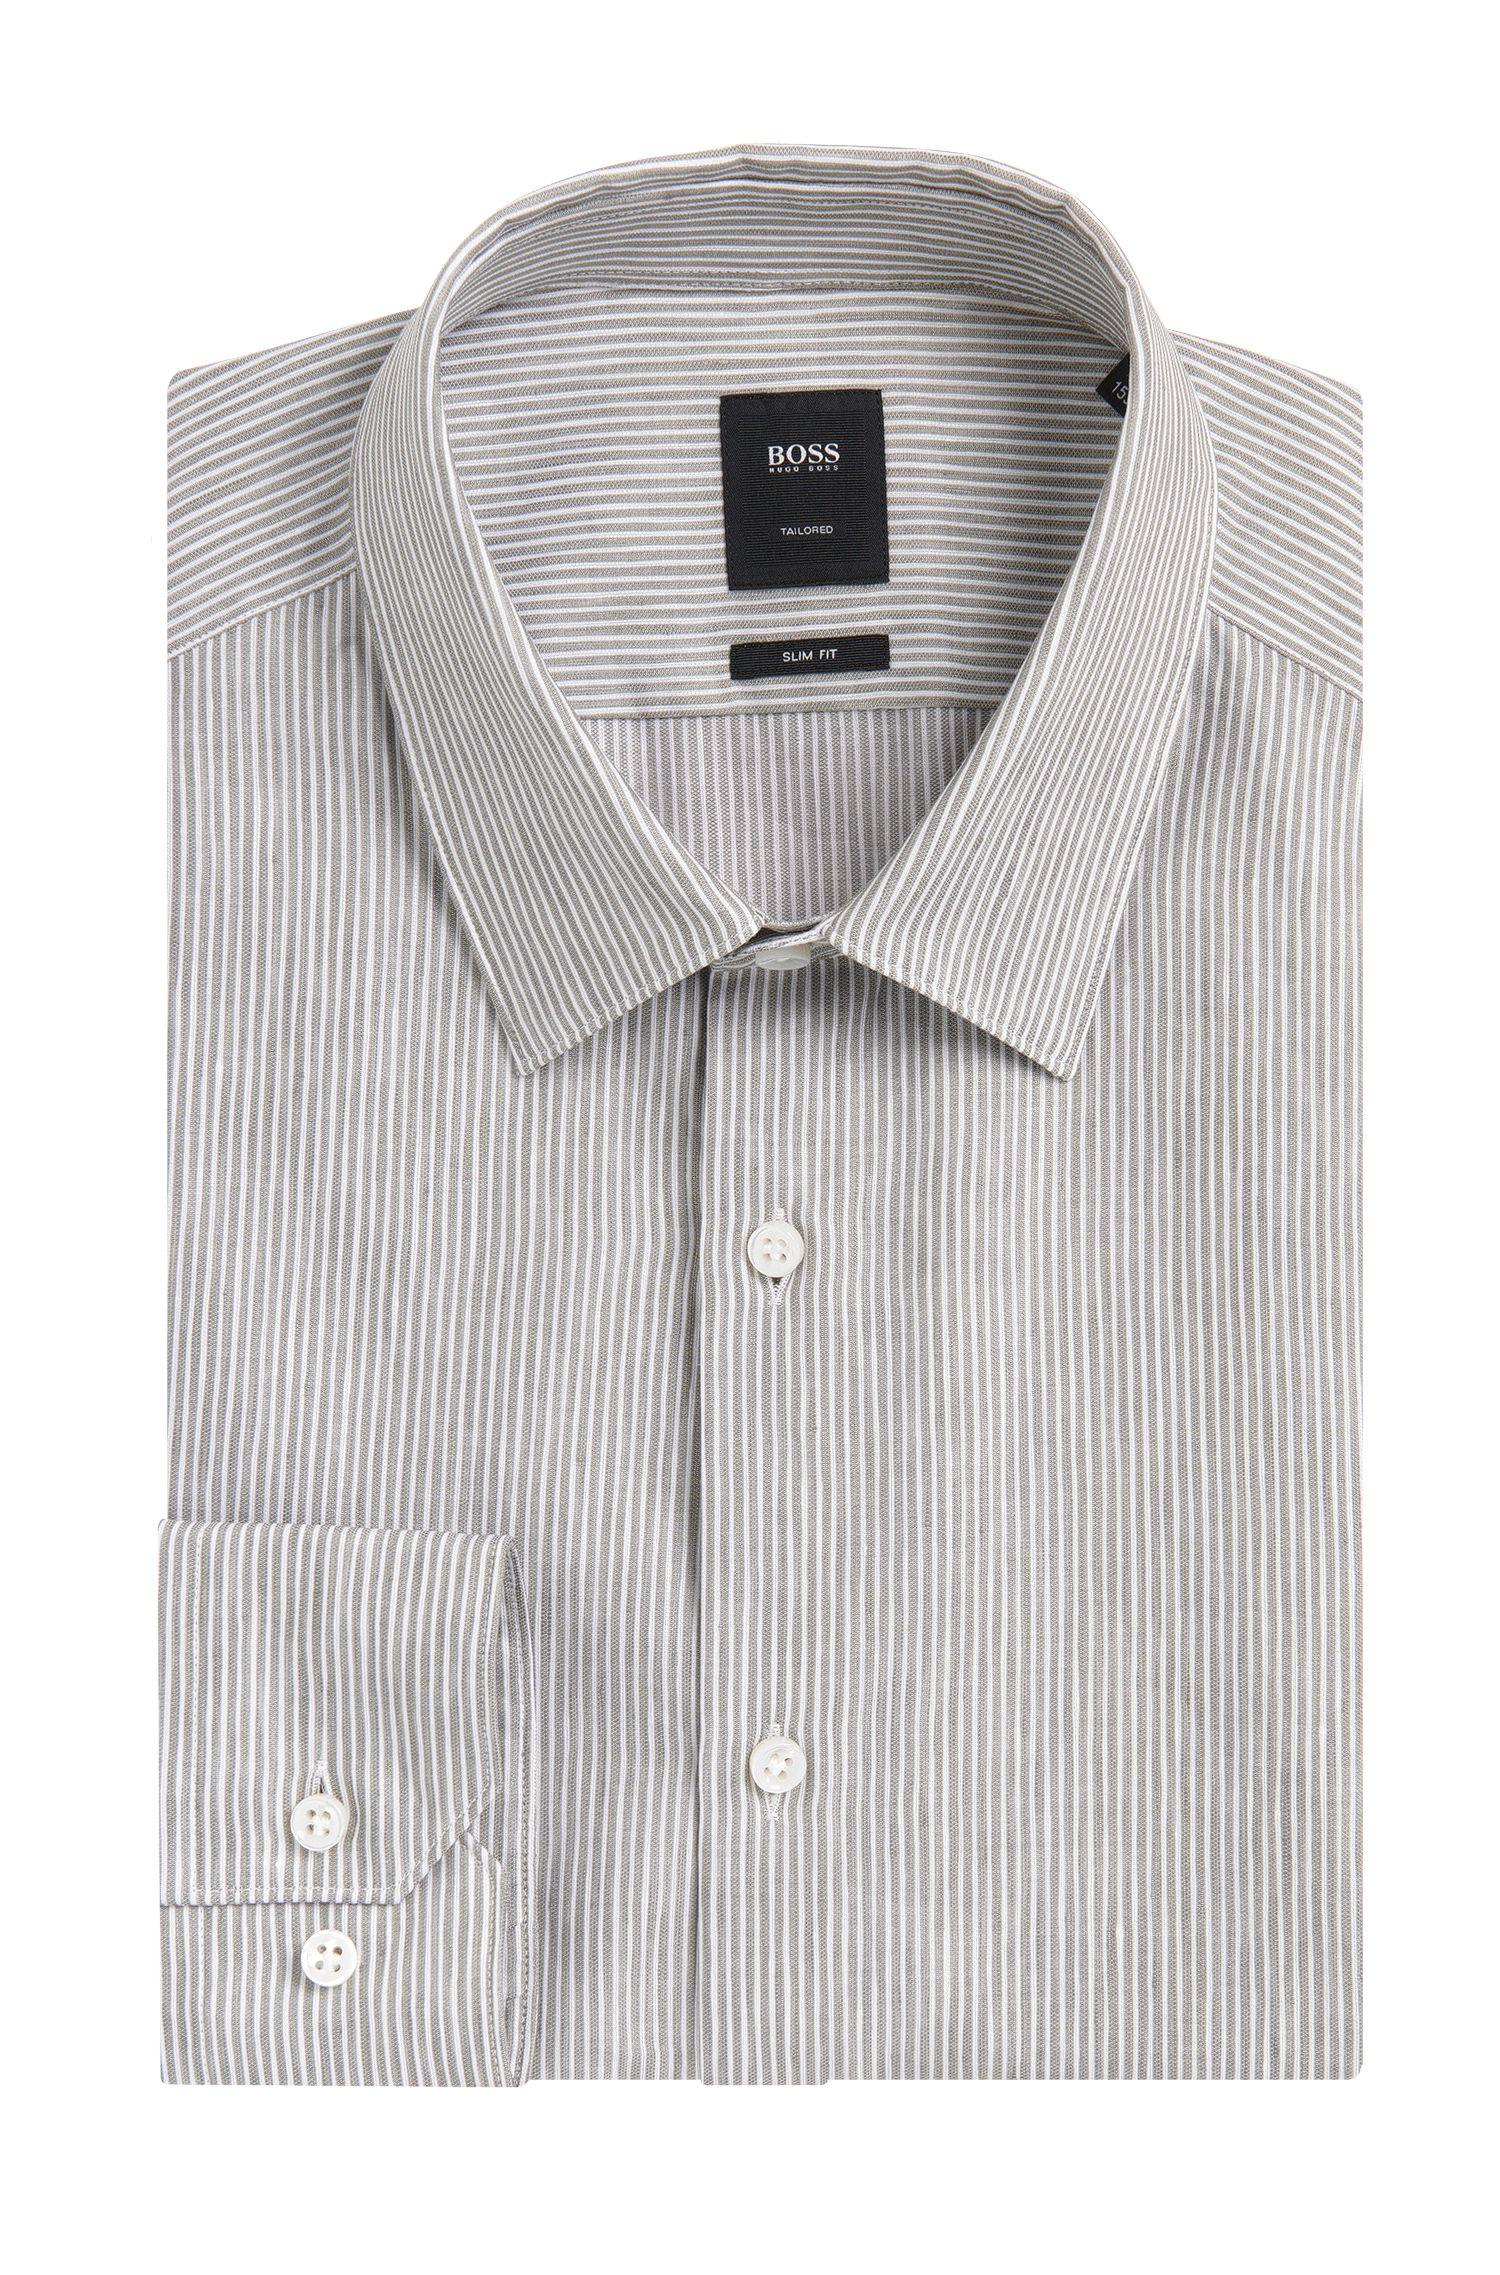 Italian Linen-Cotton Dress Shirt, Slim Fit | T-Clint